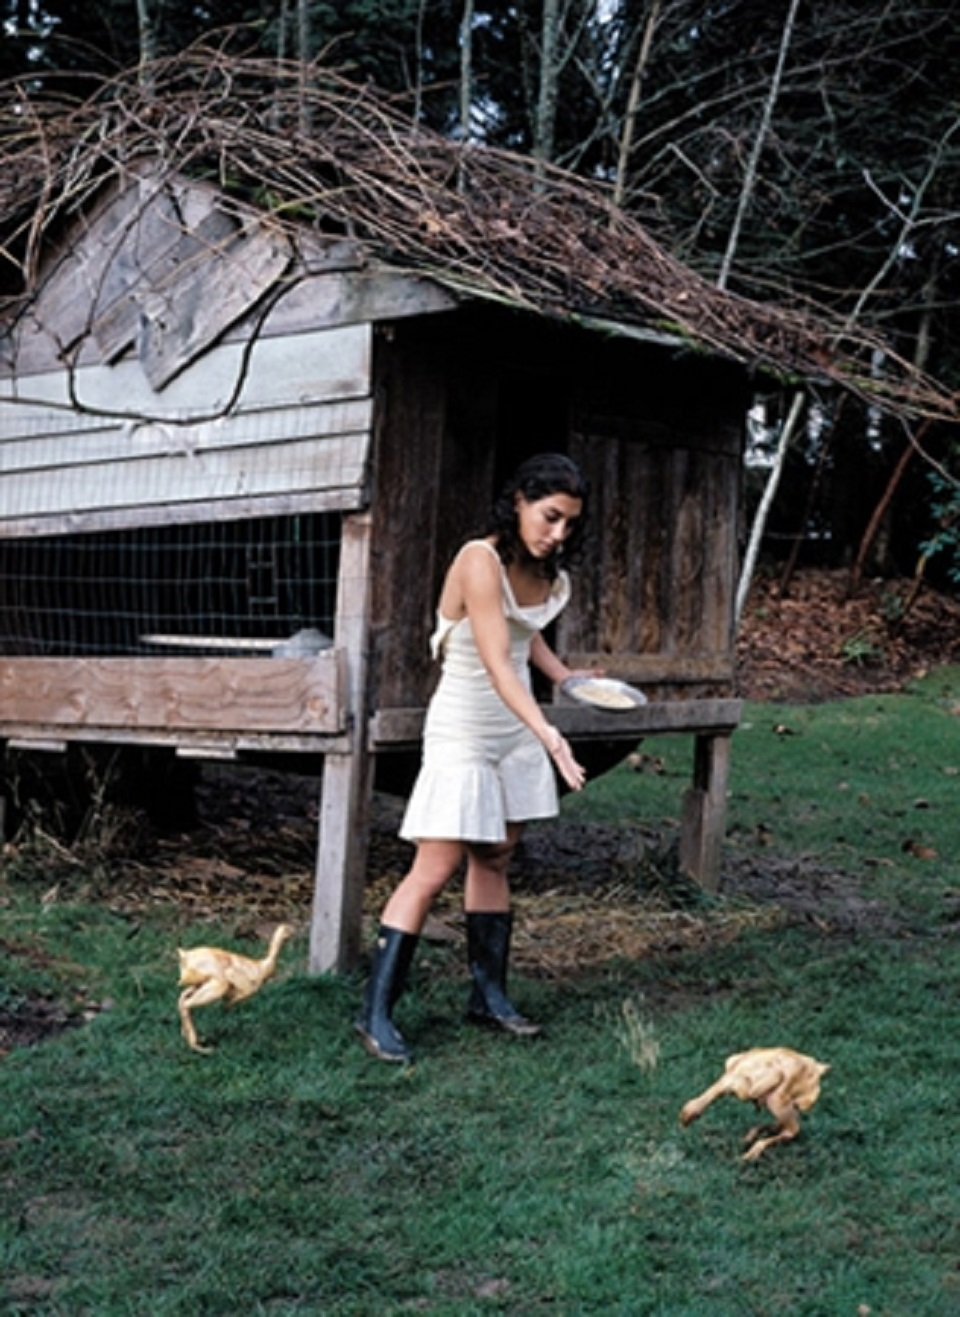 Margot Quan Knight – Chicken Feed (The Garden)